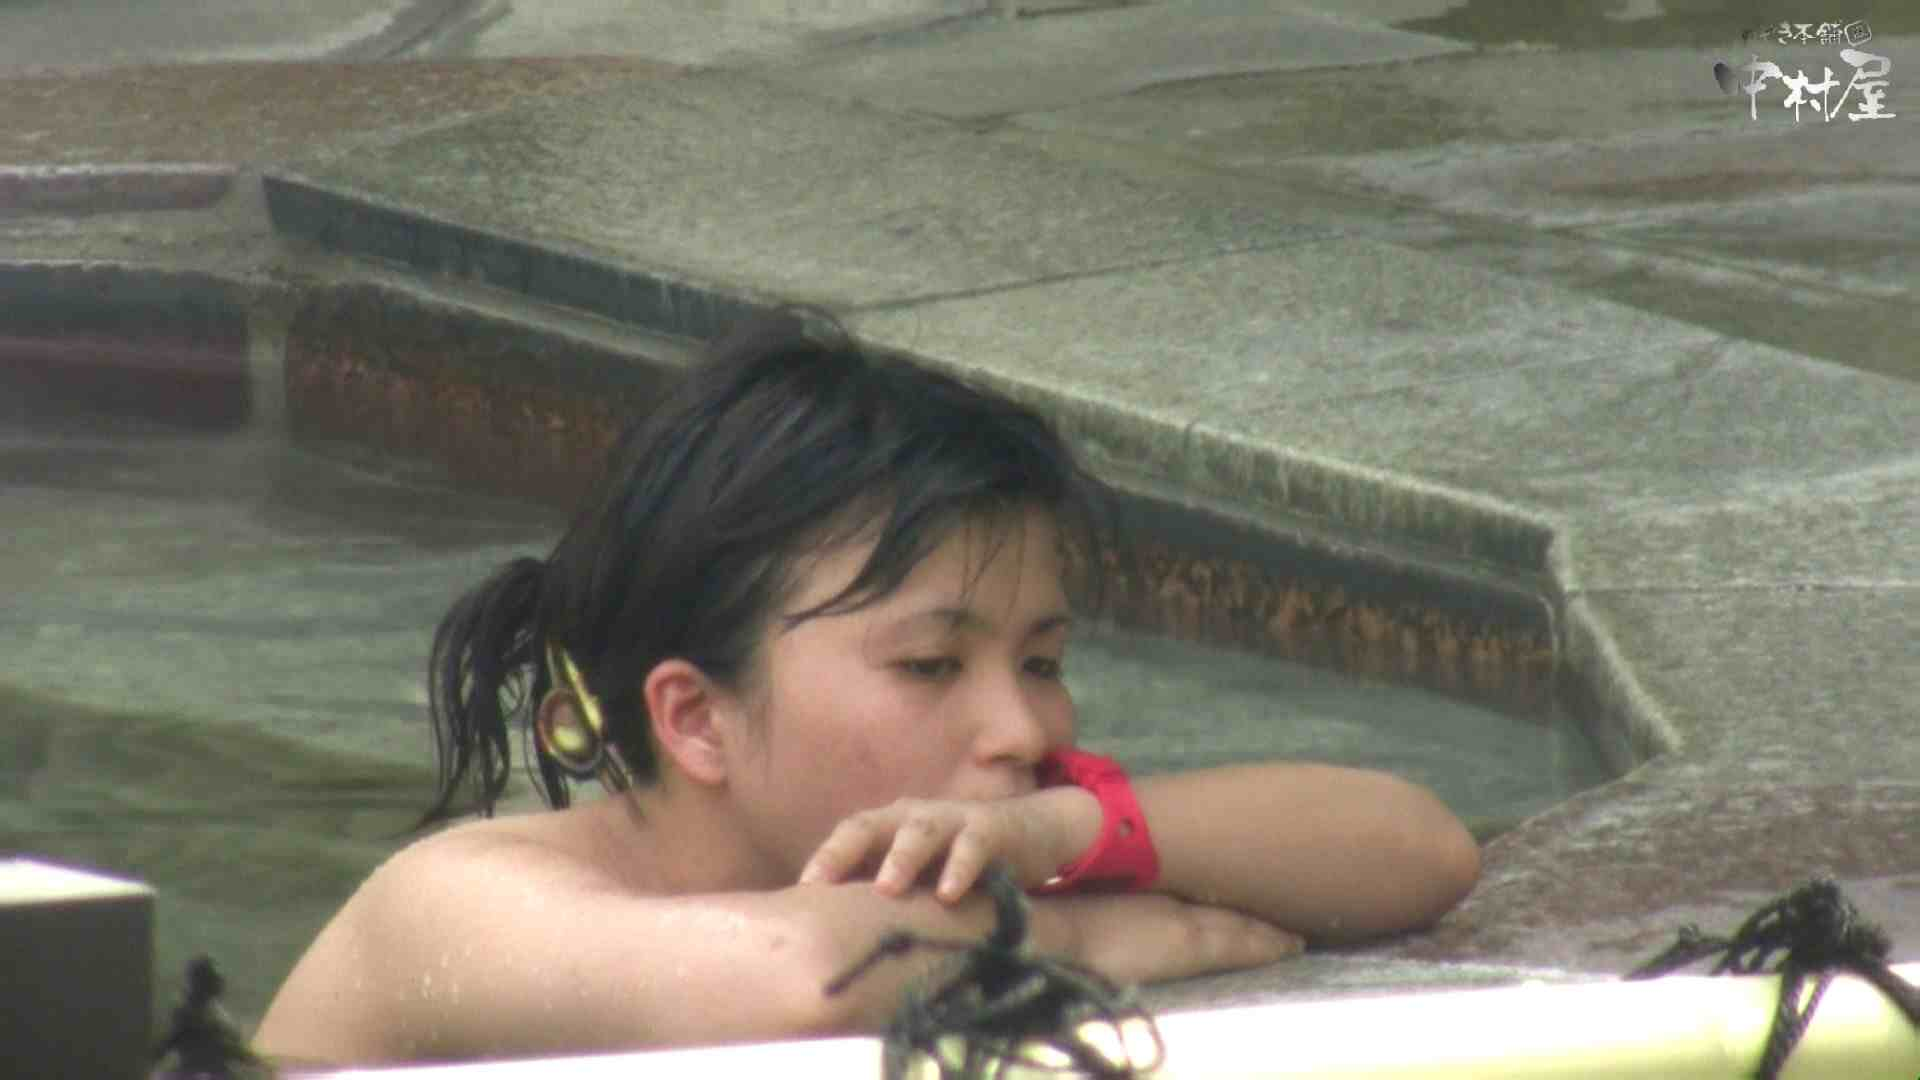 Aquaな露天風呂Vol.894 盗撮師作品 セックス画像 93pic 80